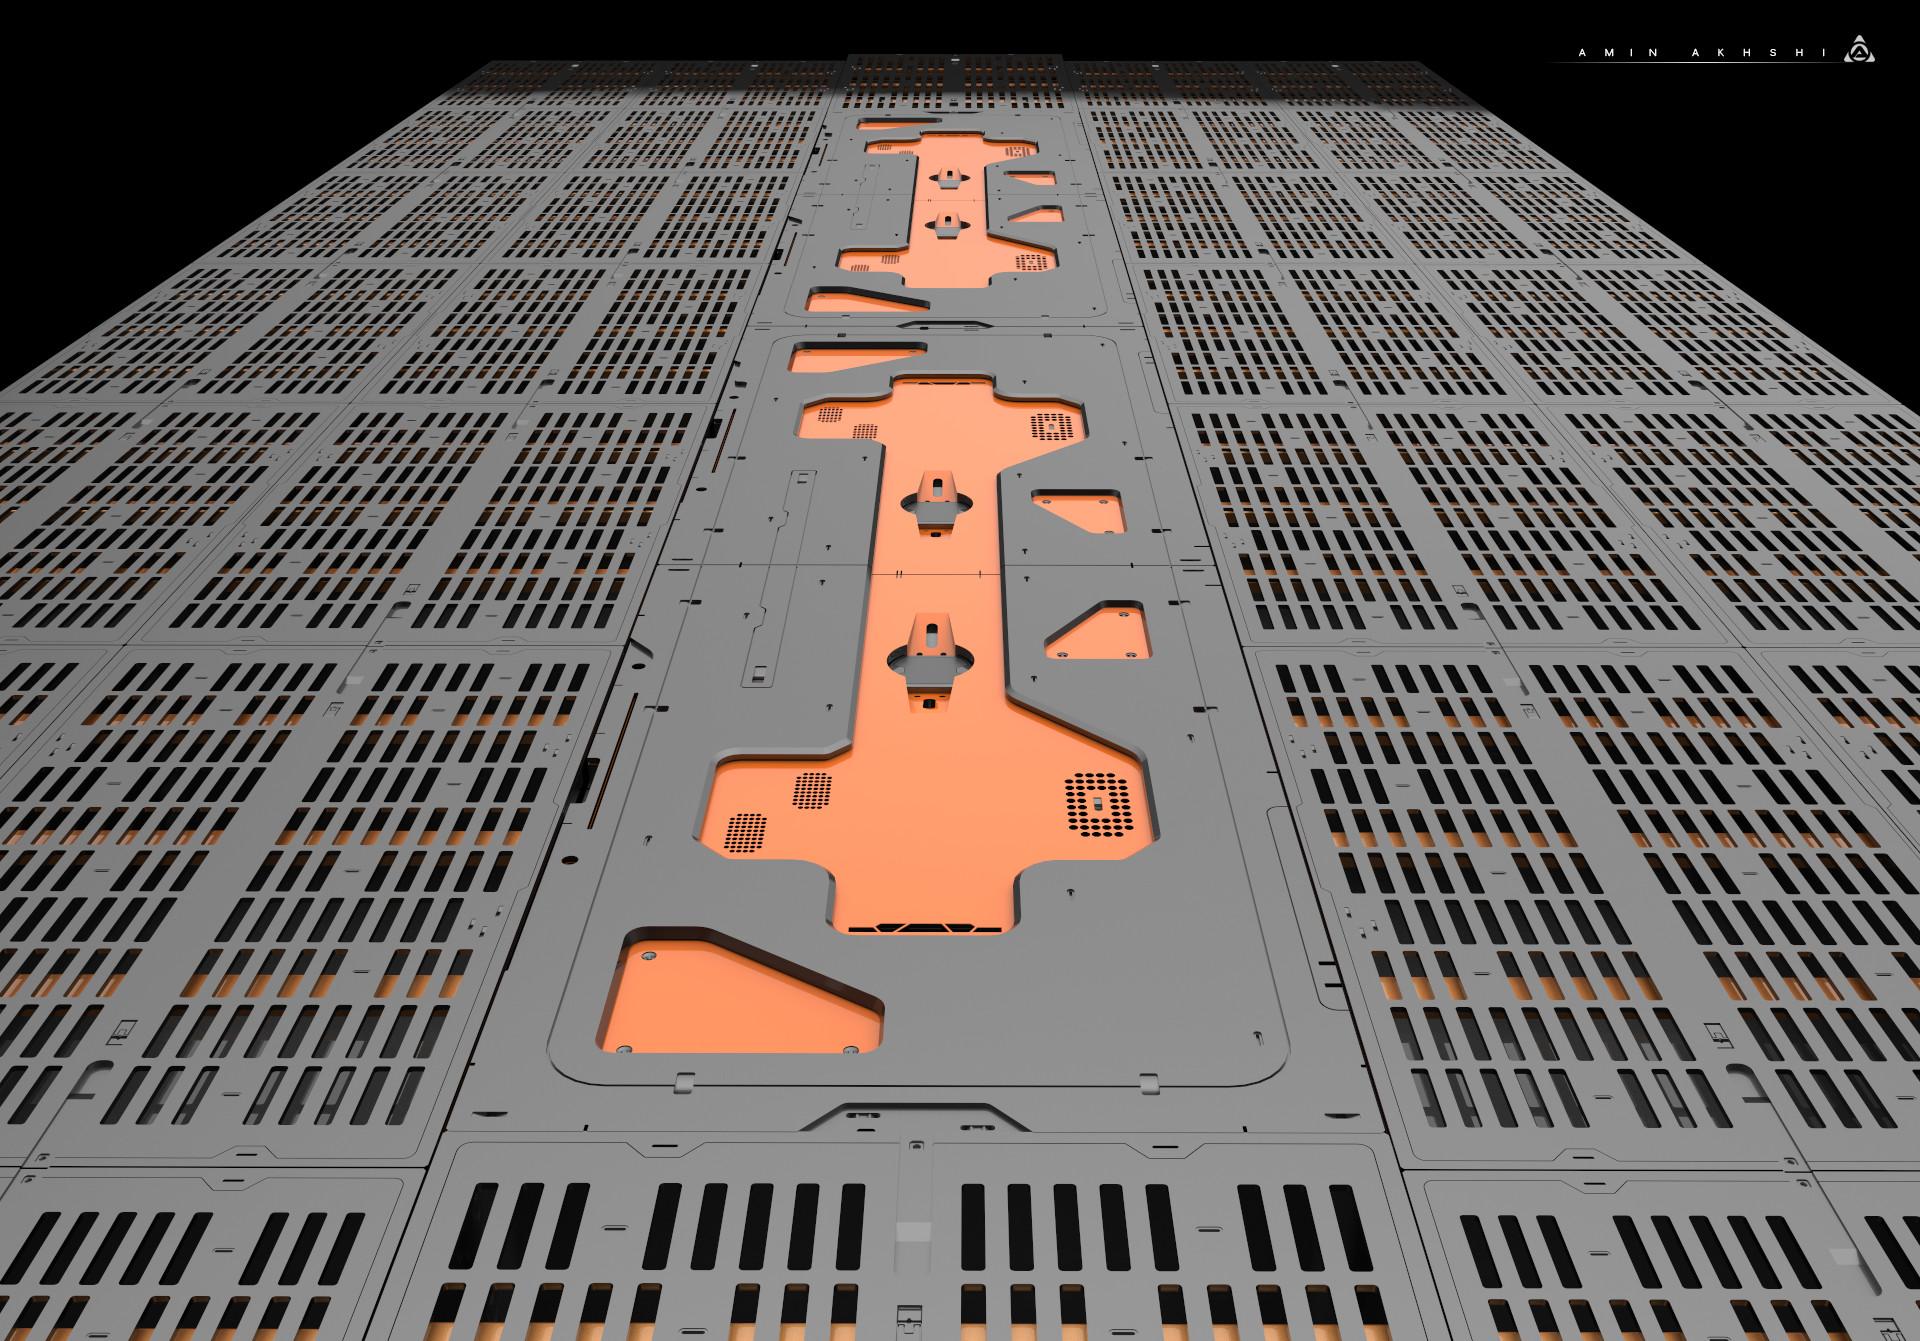 Amin akhshi sci fi floor panels 007